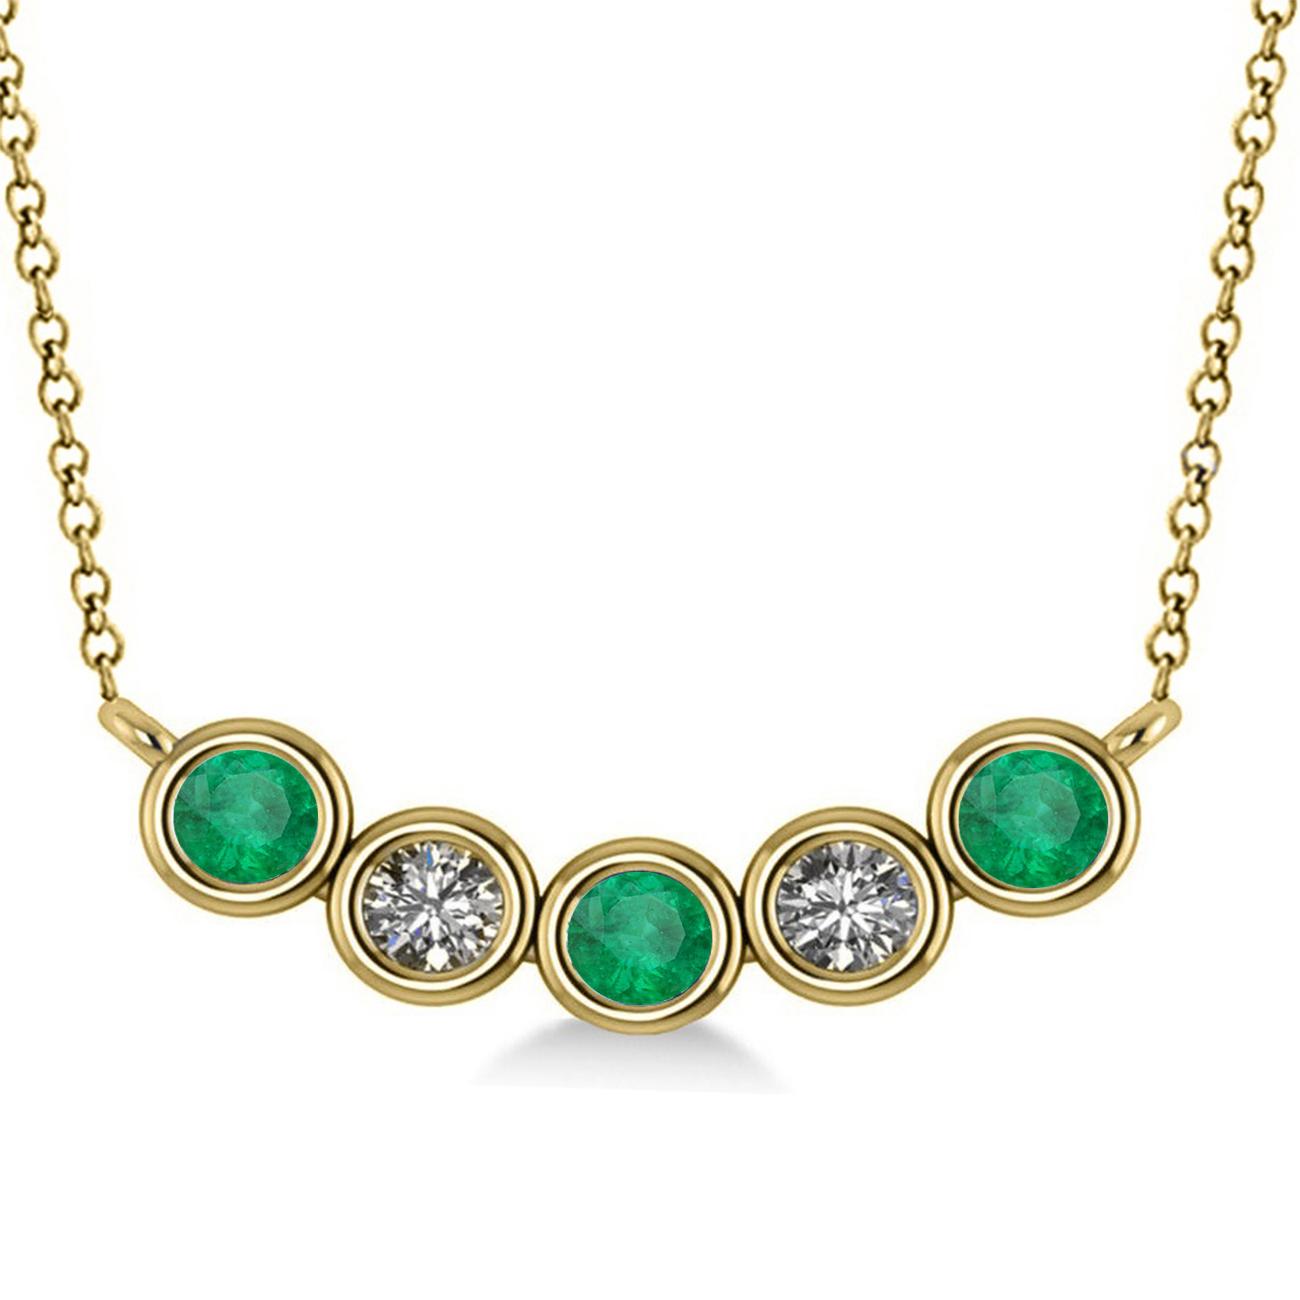 Diamond & Emerald 5-Stone Pendant Necklace 14k Yellow Gold ... - photo#4